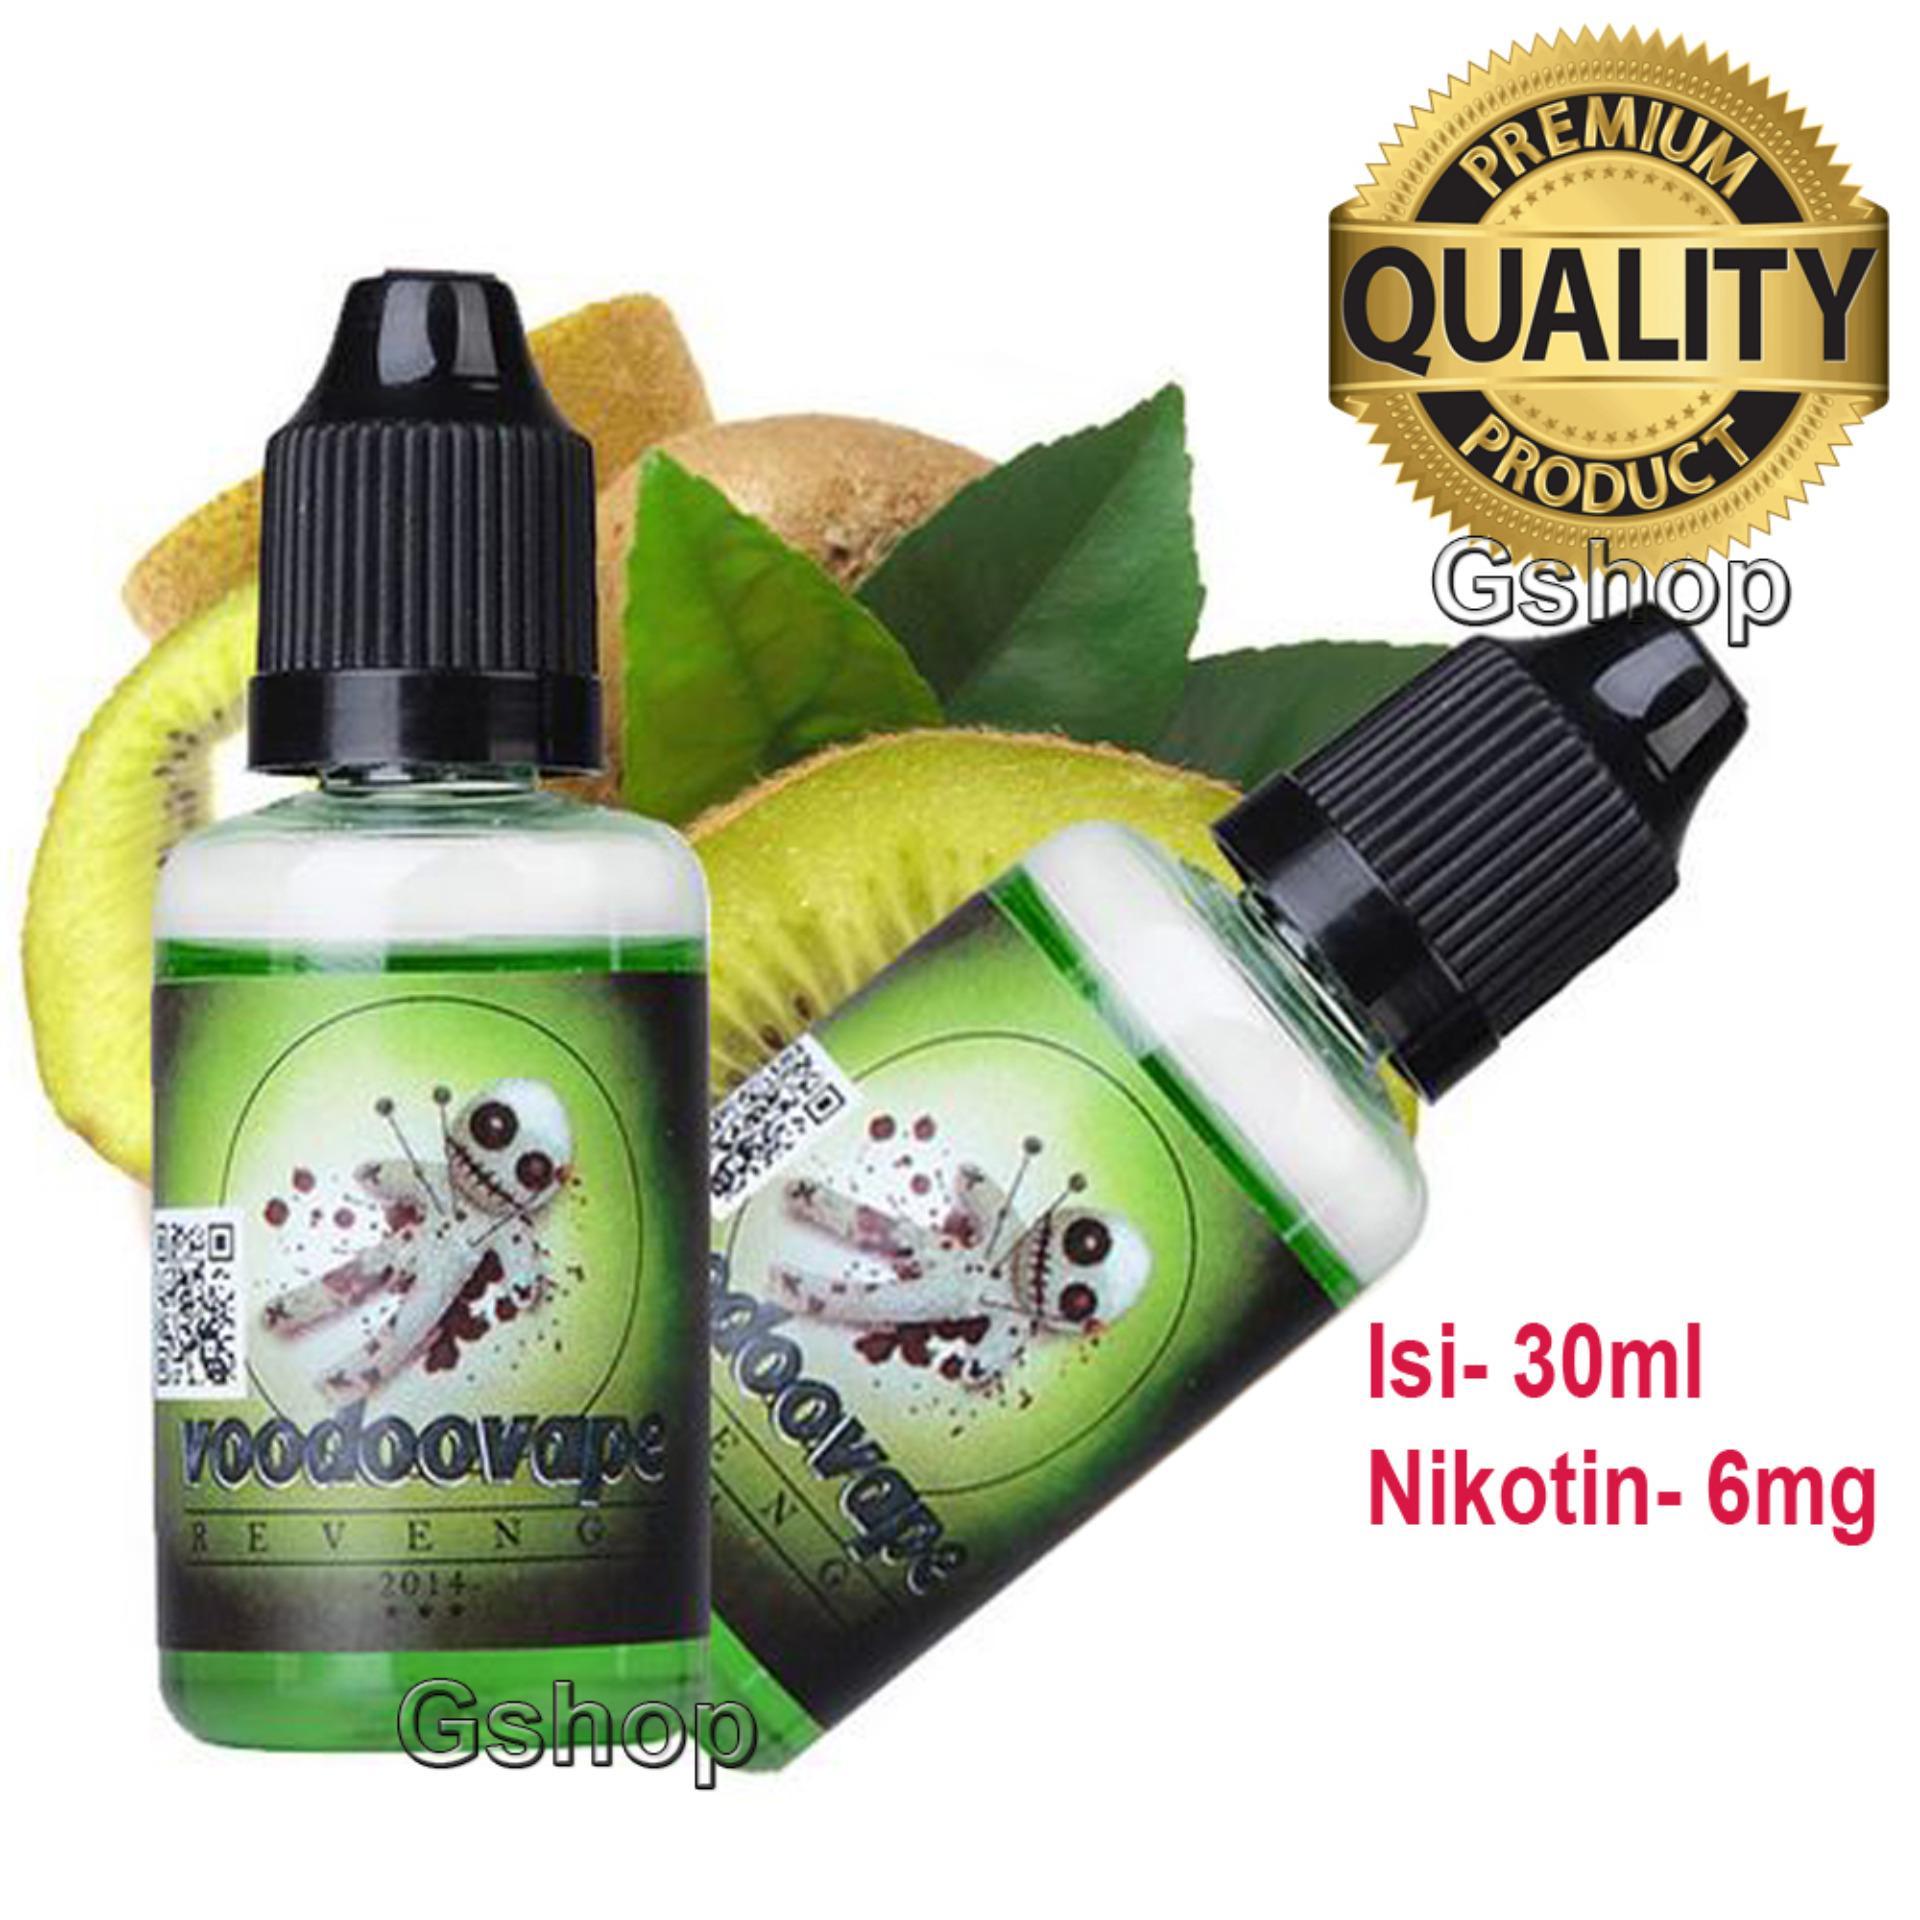 Price Checker Gshop Premium E-Liquids 30ml (Revenge) 6mg Nicotine for Electronic Cigarettes